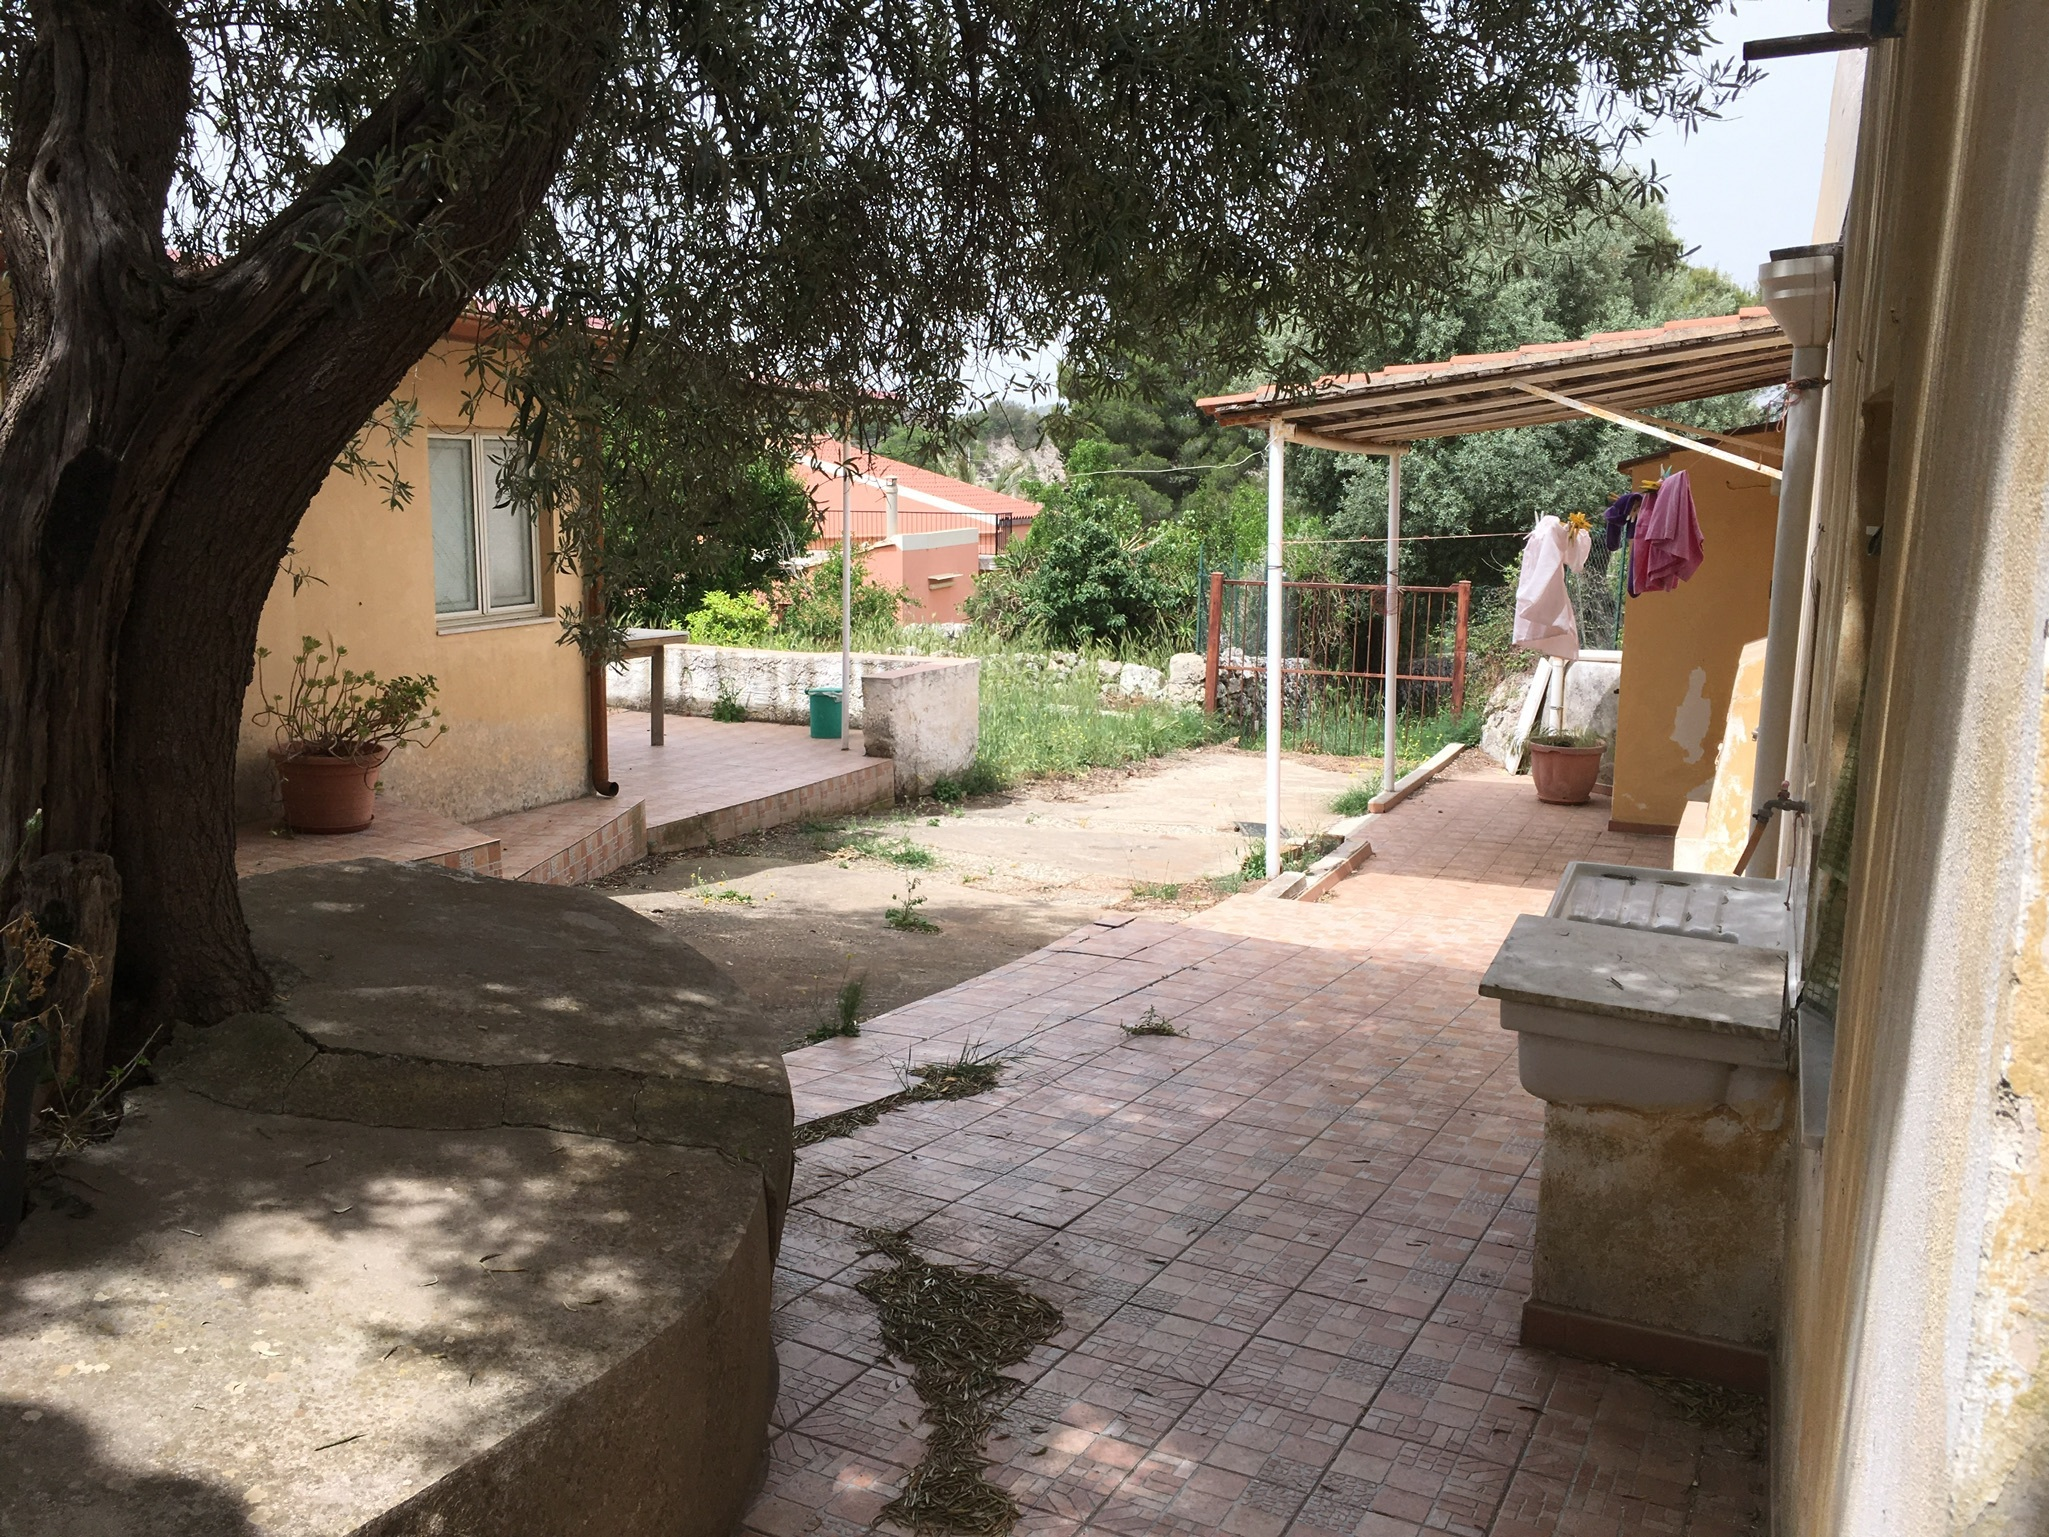 Rif ia170ca villa vendita a canicattini bagni for Vendita bagni on line